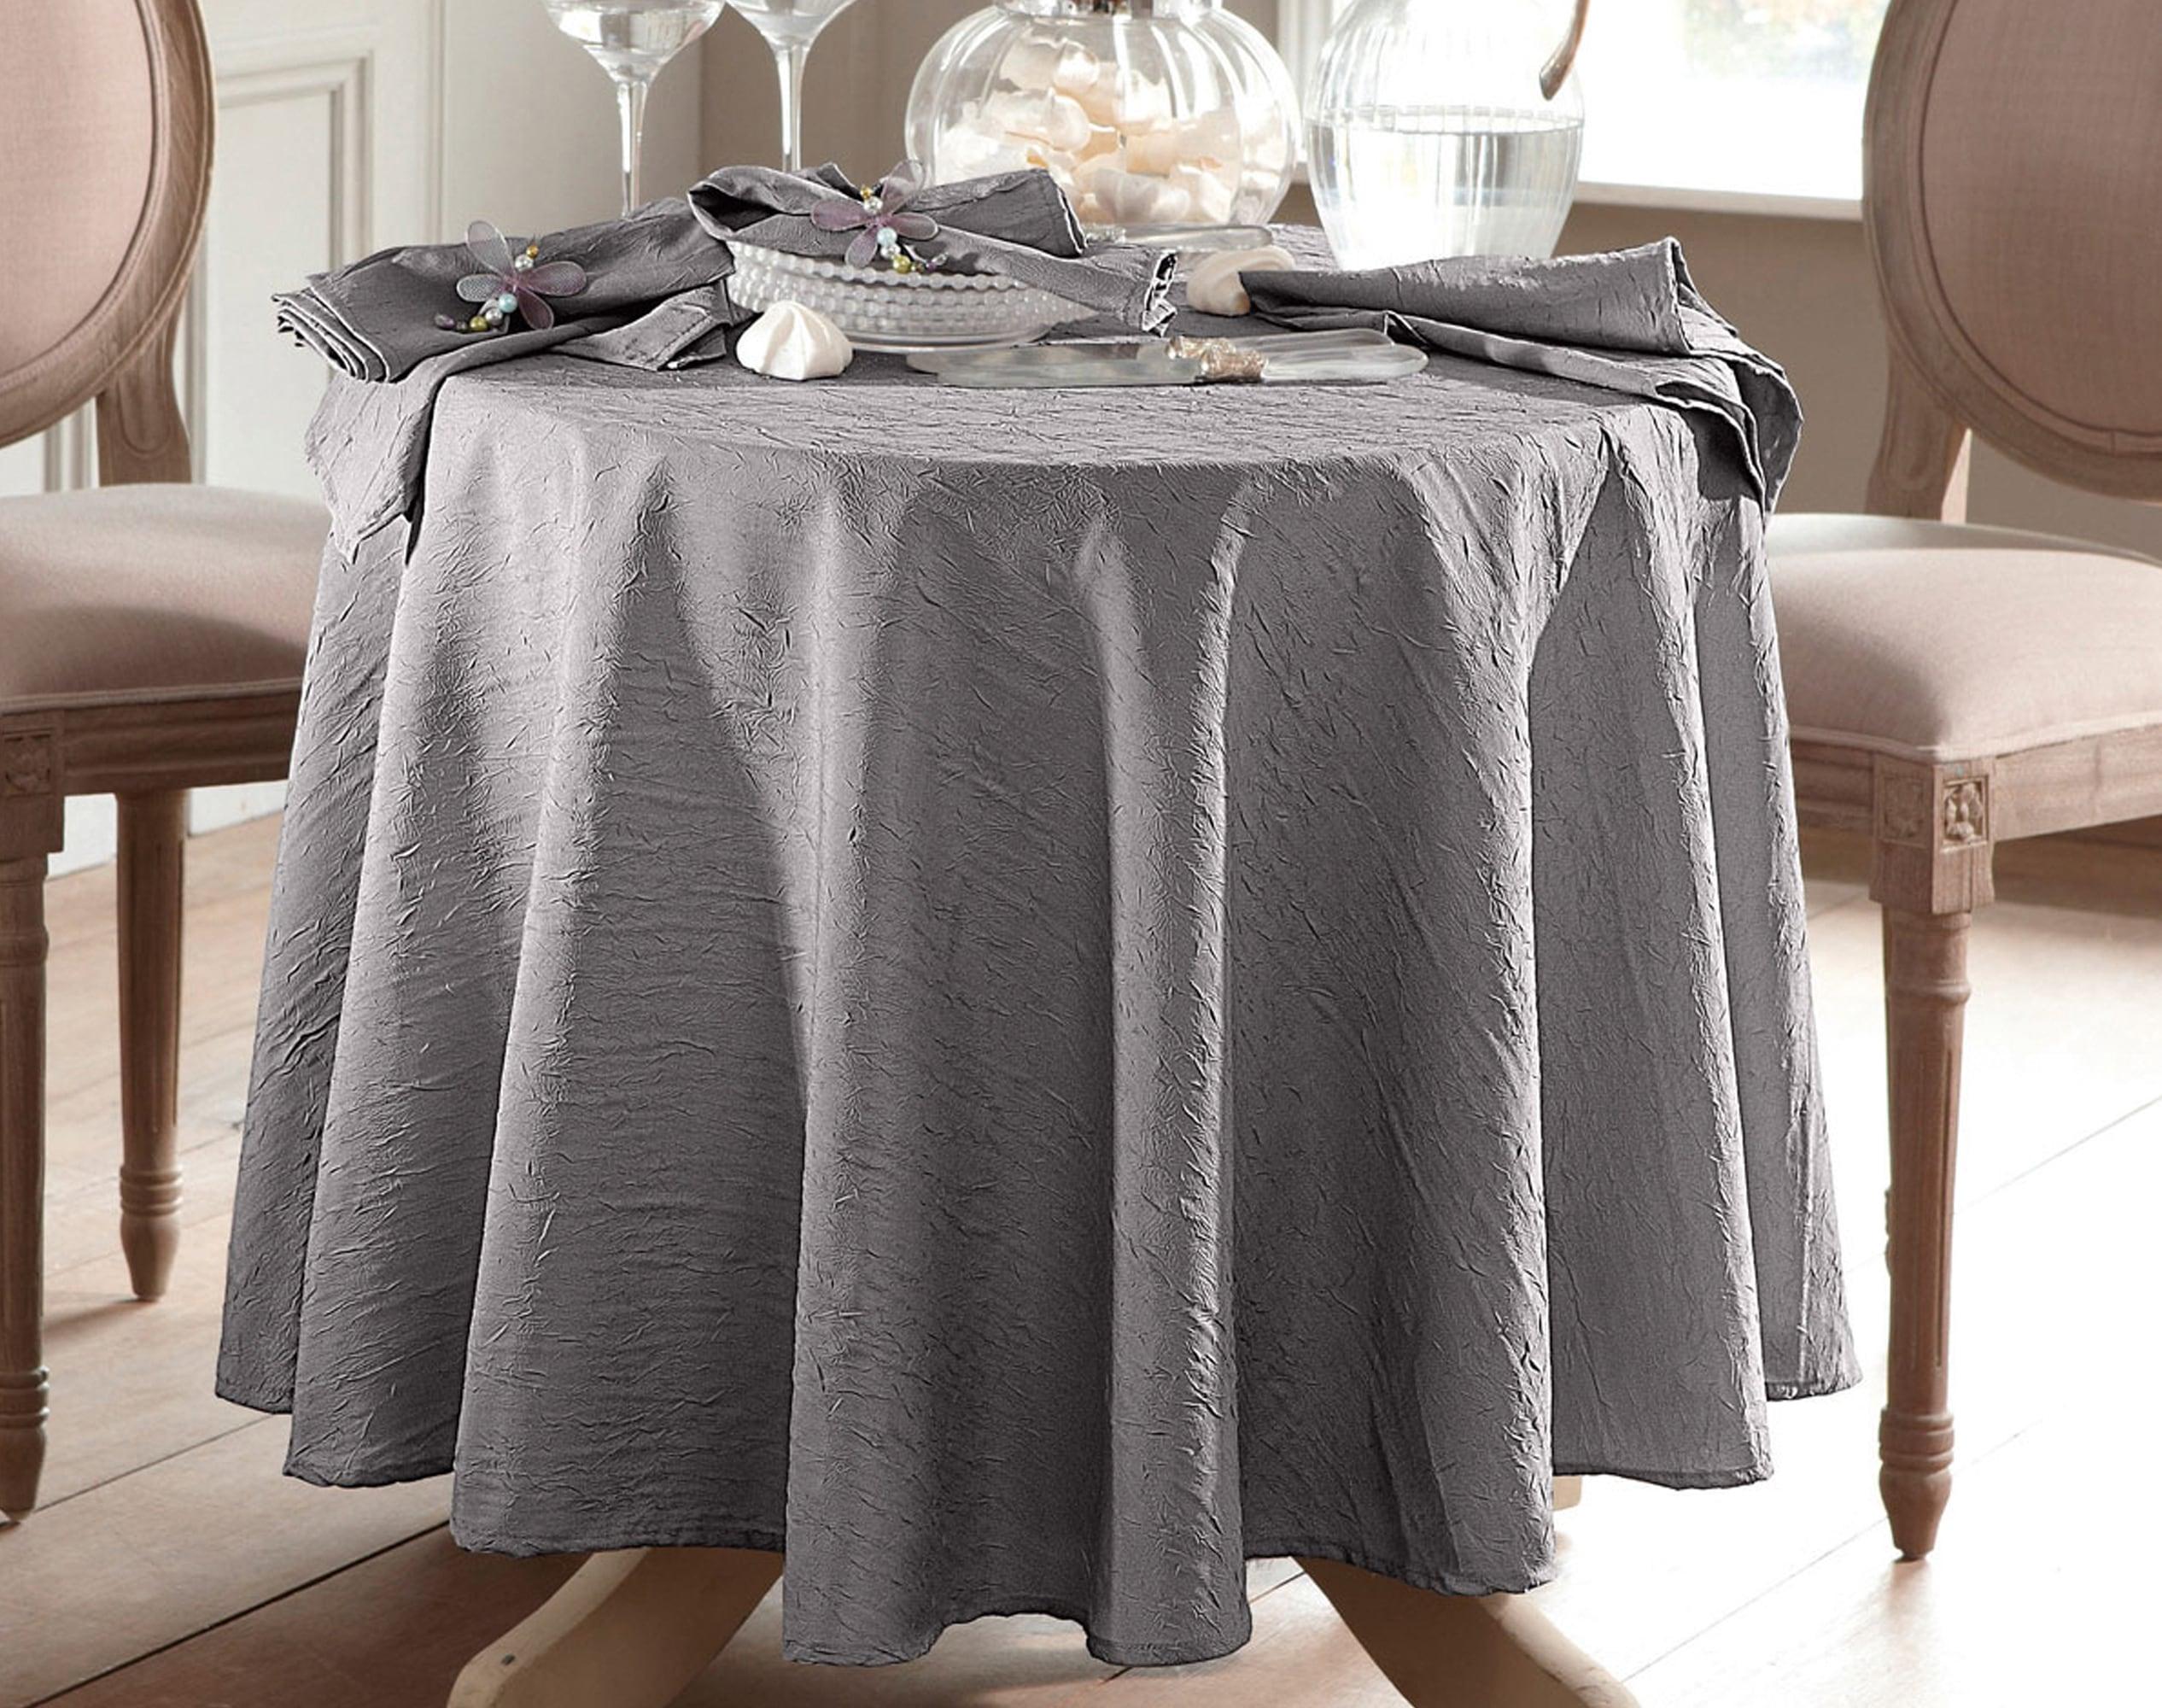 Nappe rectangulaire gris en polyester 150x200